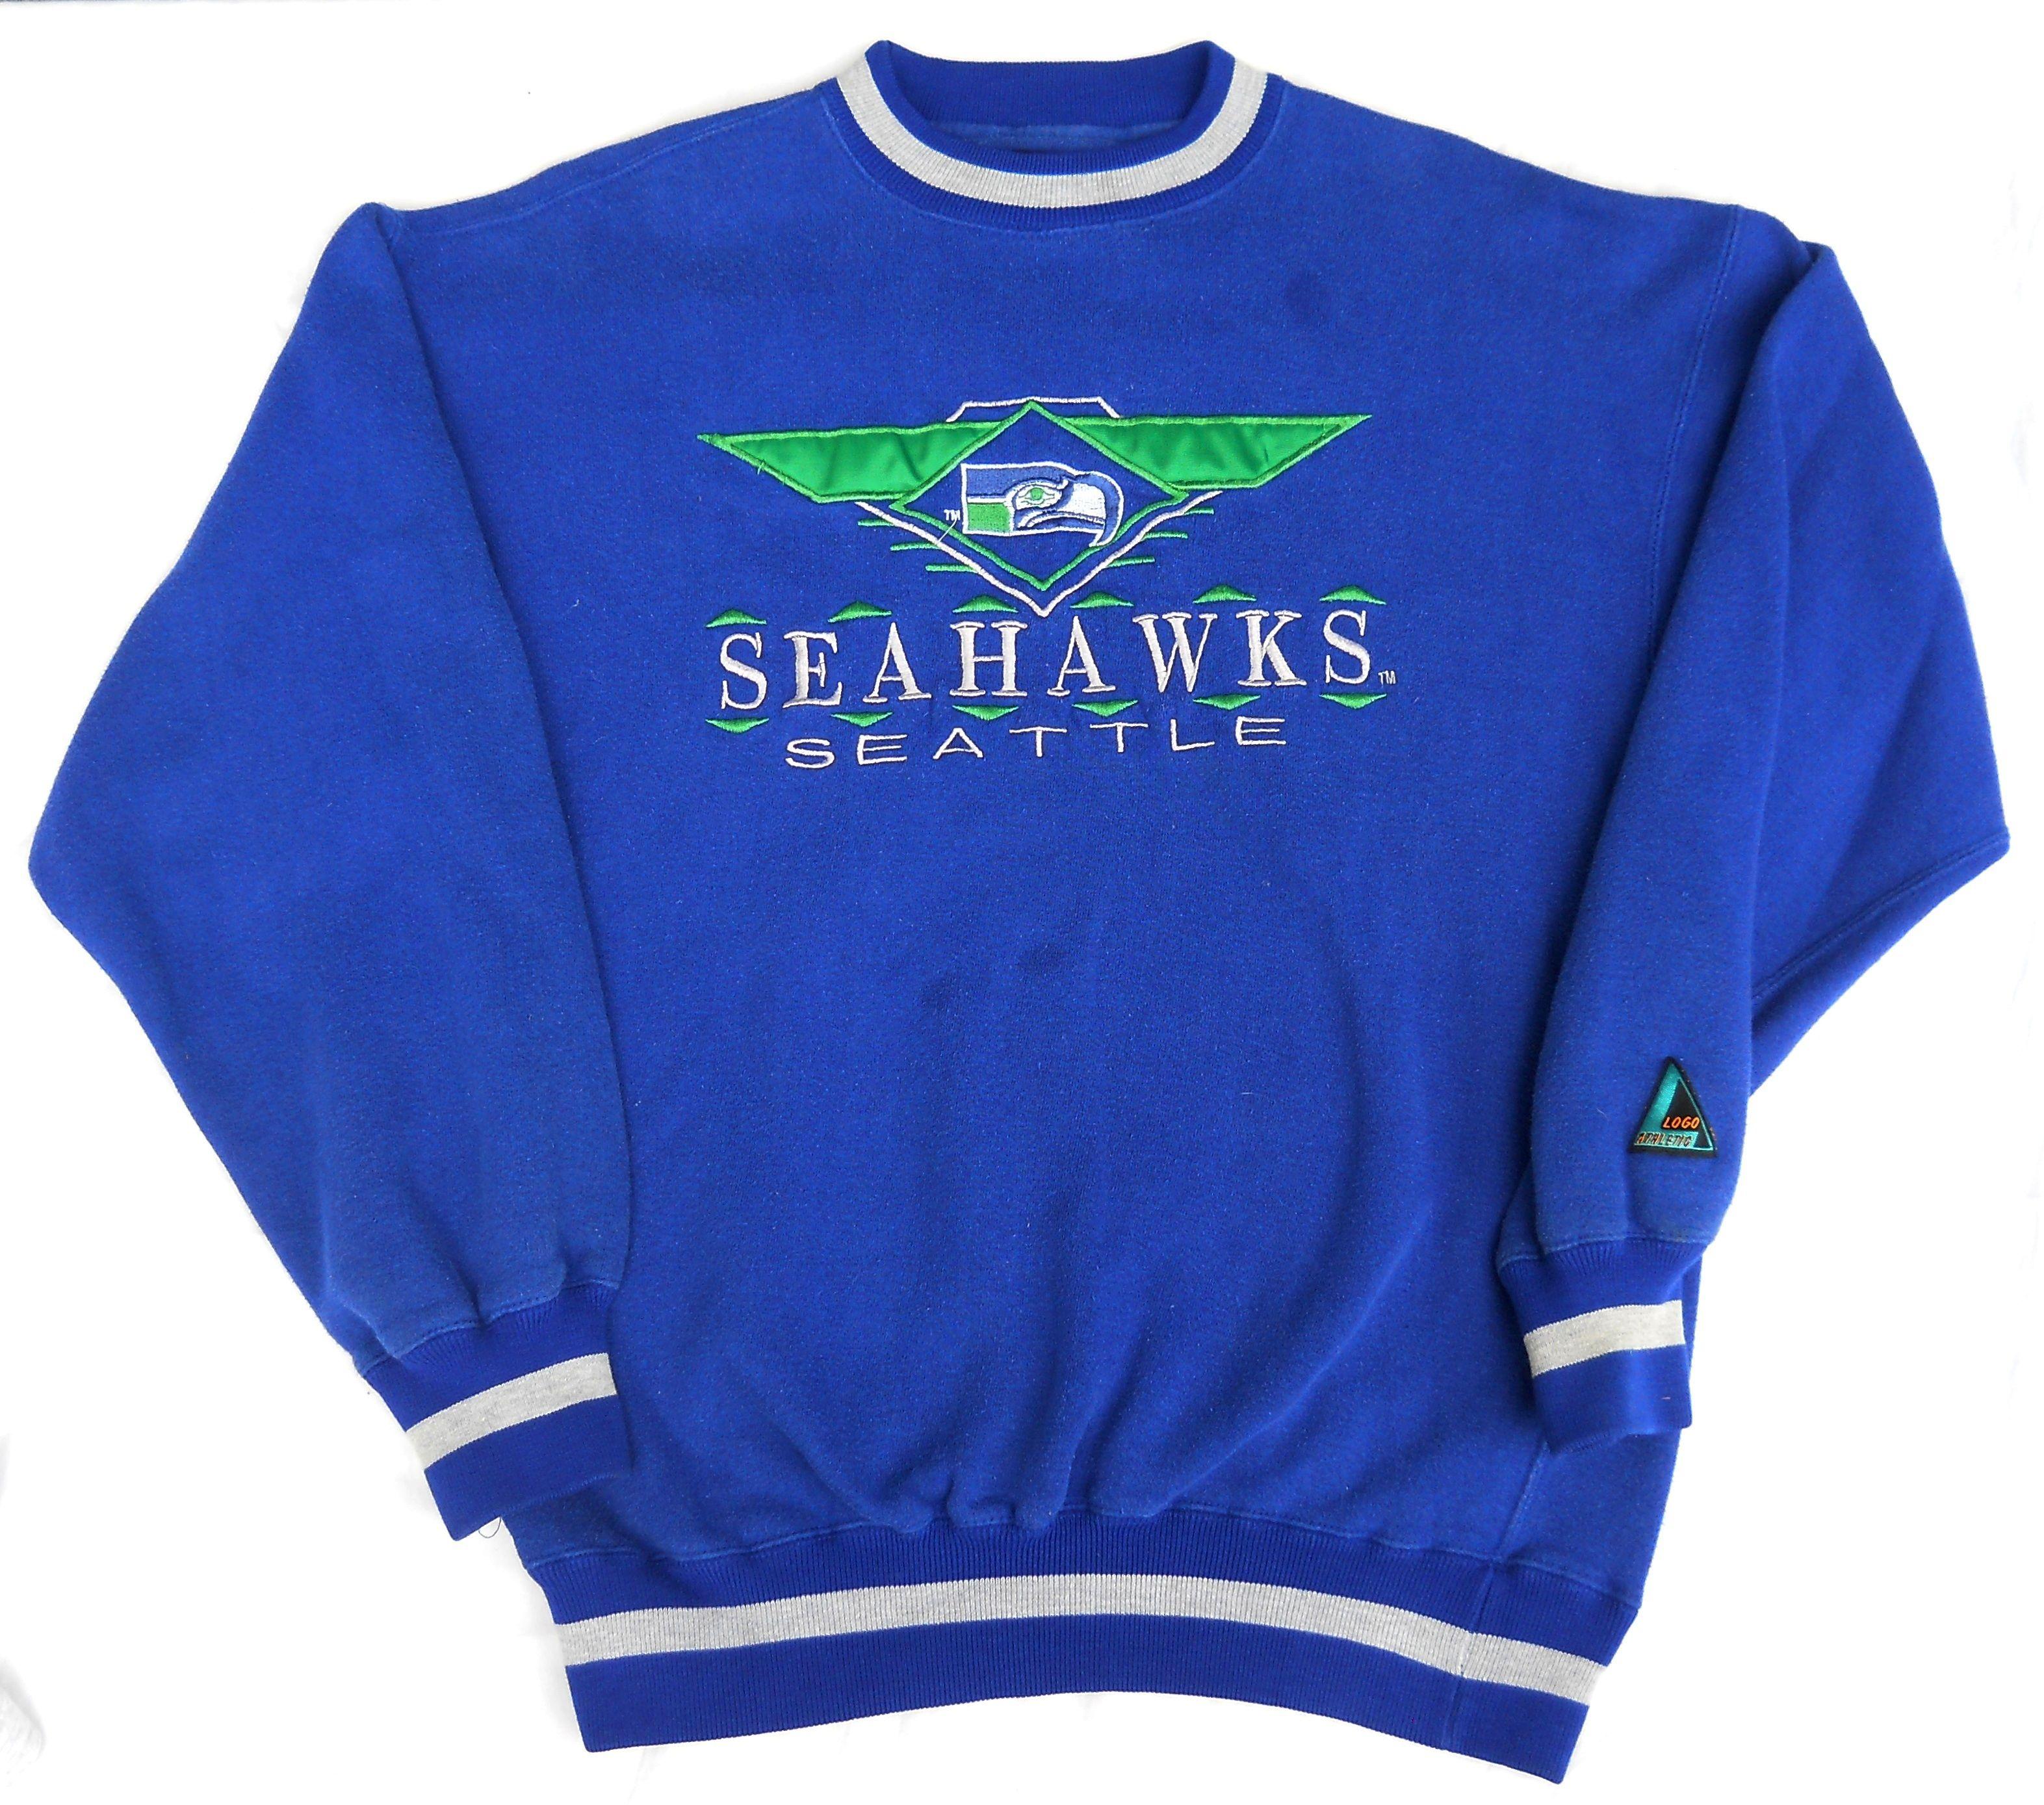 Predownload: Vintage 1992 Seattle Seahawks Crewneck Sweatshirt By Logo Athletic Men S Medium Pre Owned Sudaderas [ 2777 x 3145 Pixel ]